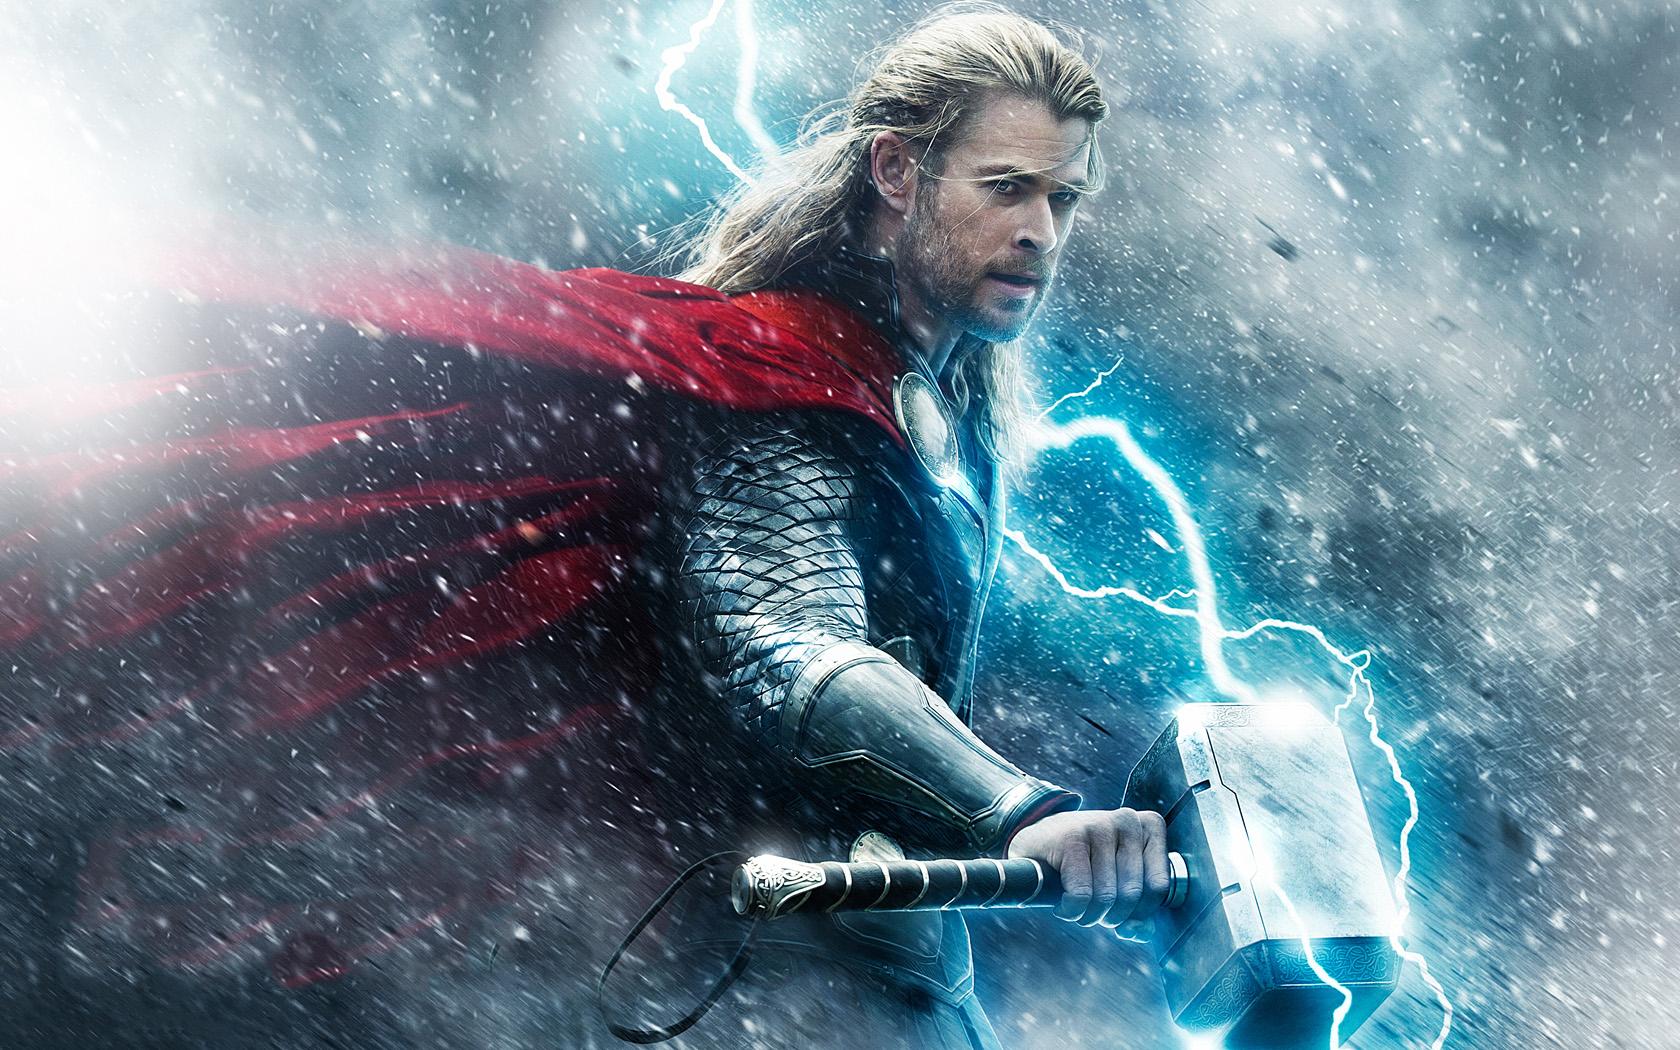 Free Thor Wallpaper 33507 1680x1050 px